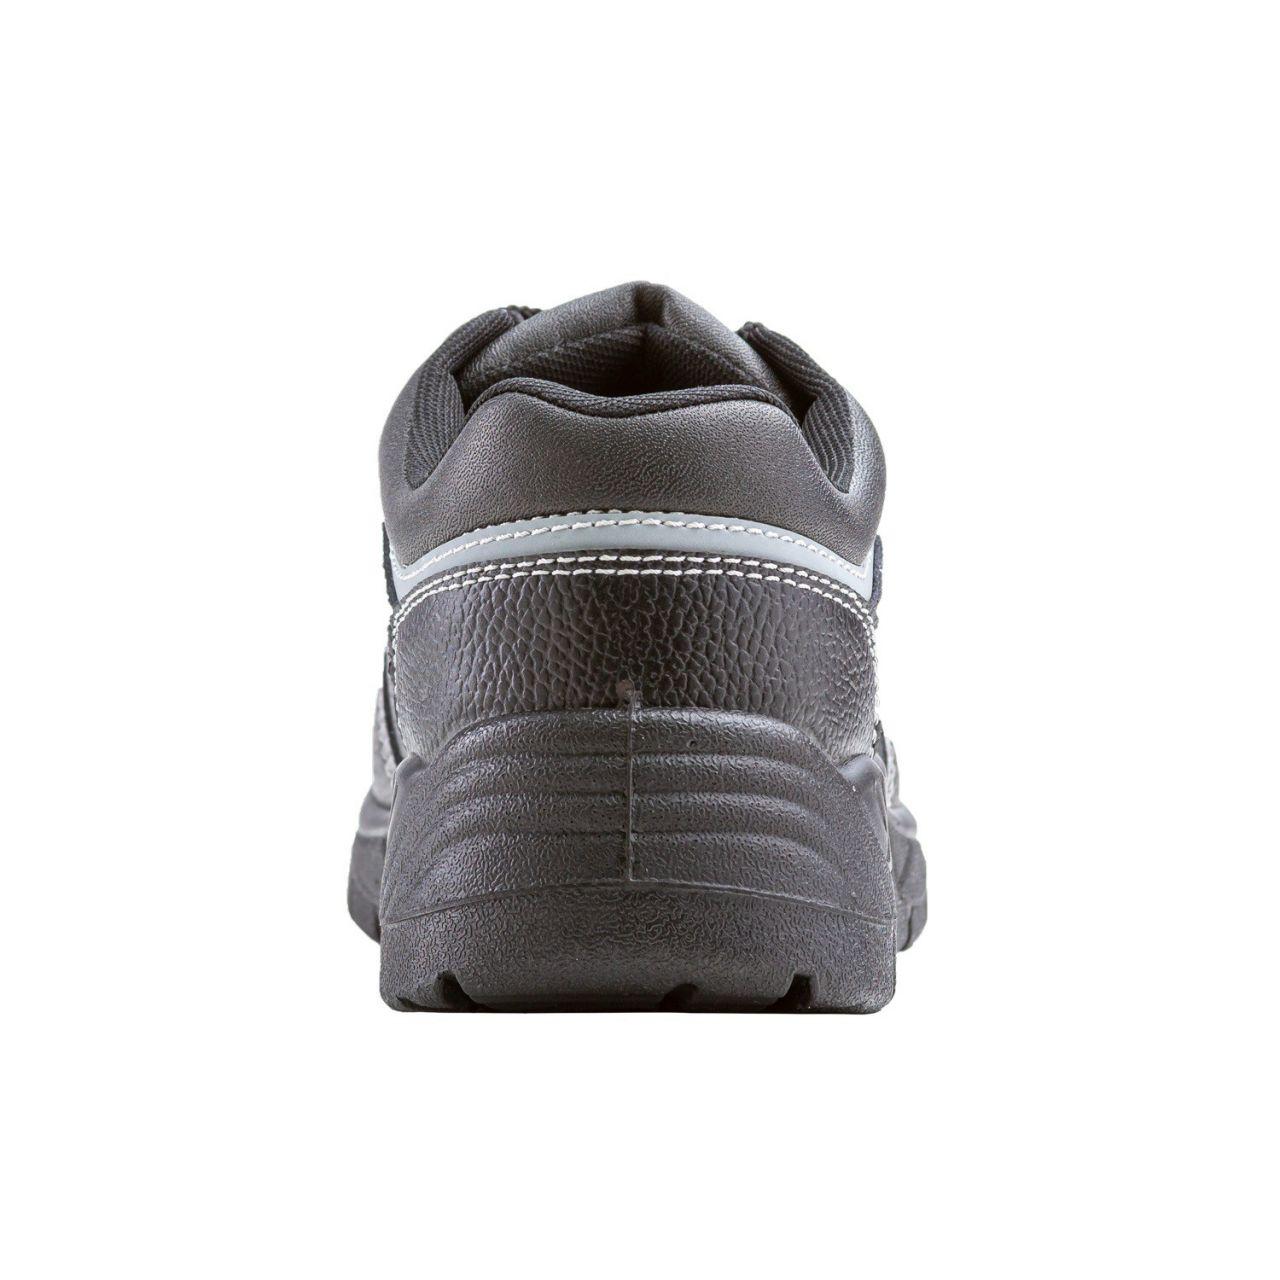 Coverguard Nacrite S1P SRC Fekete Védőcipő